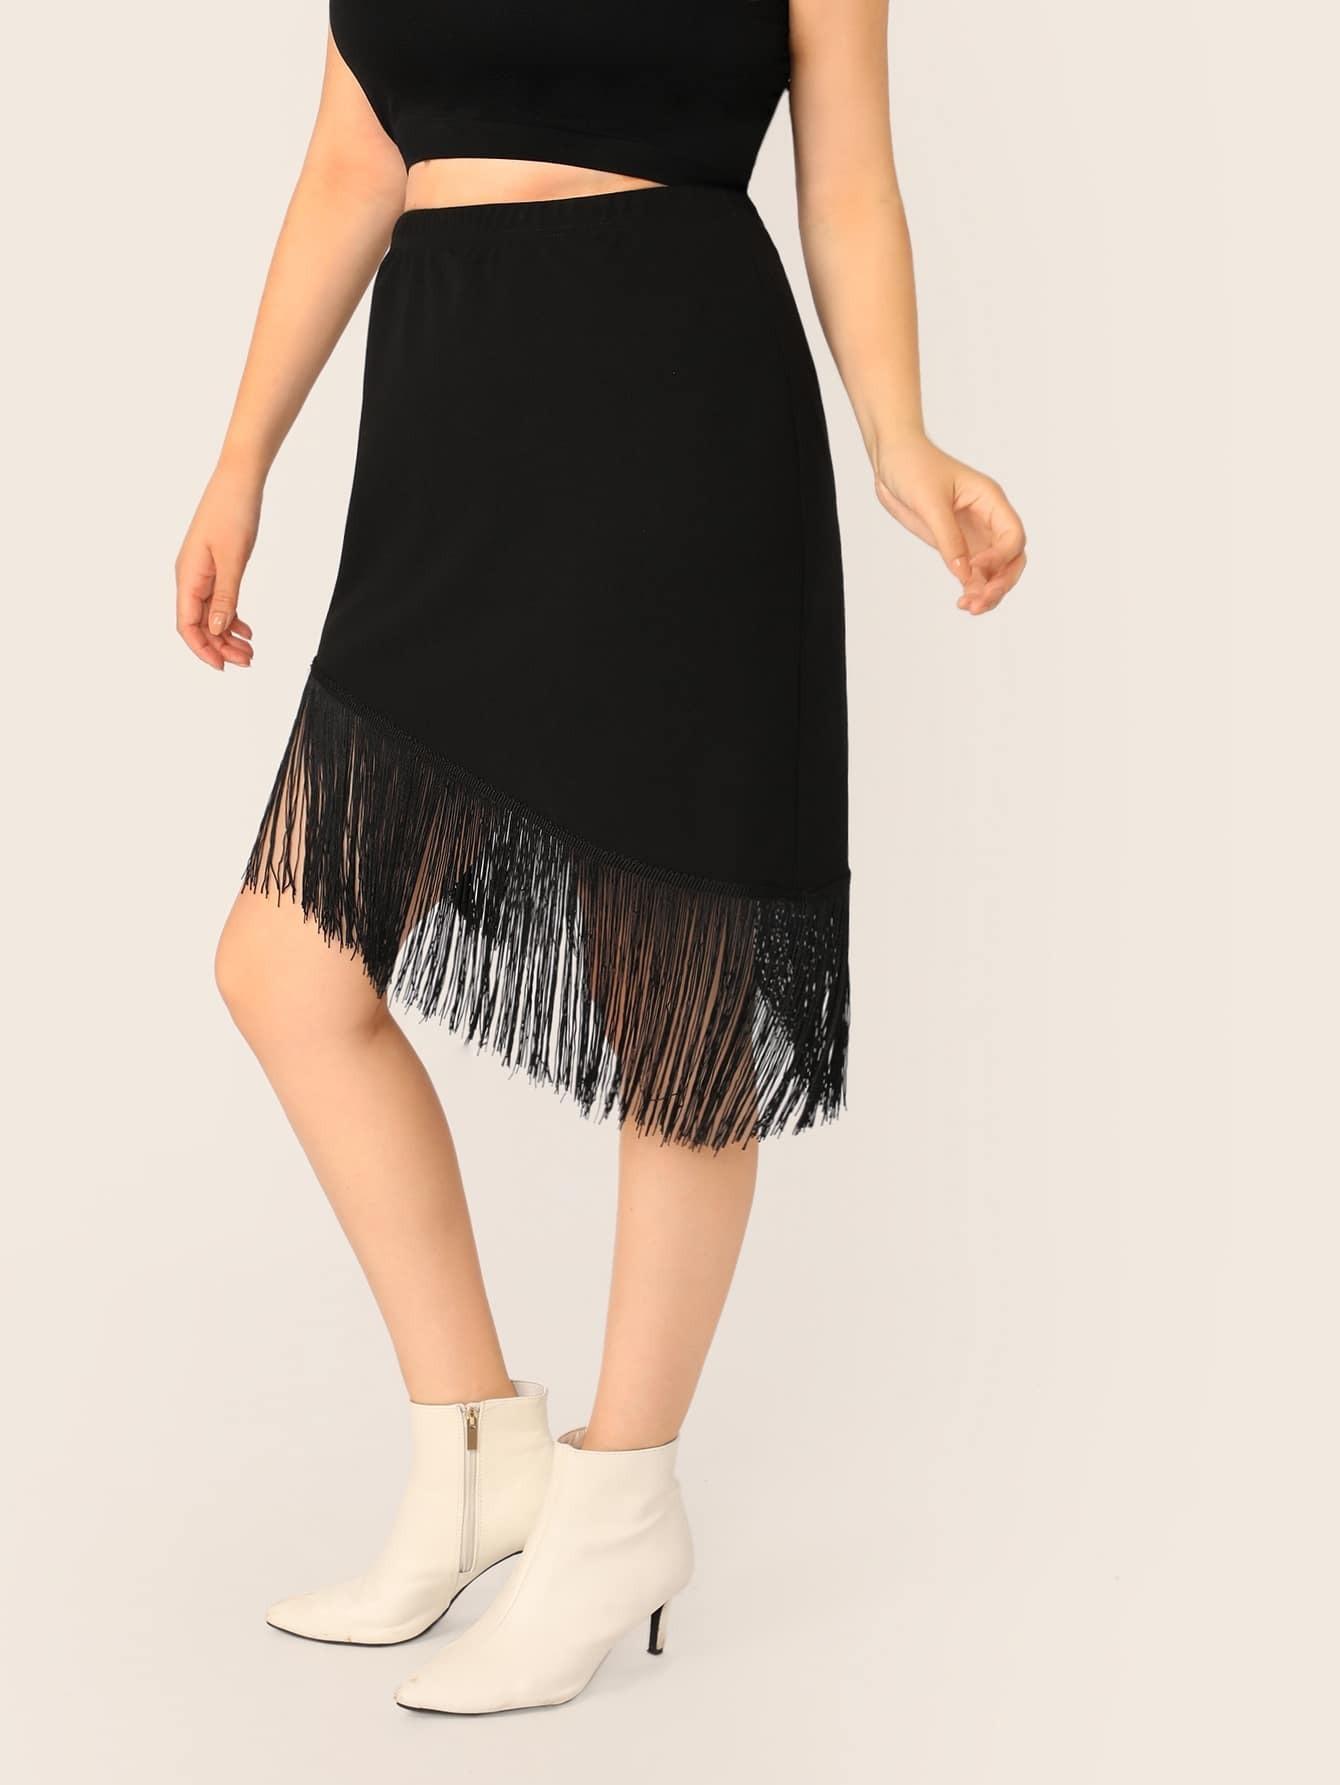 Фото - Асимметричная юбка размера плюс с бахромой от SheIn цвет чёрные